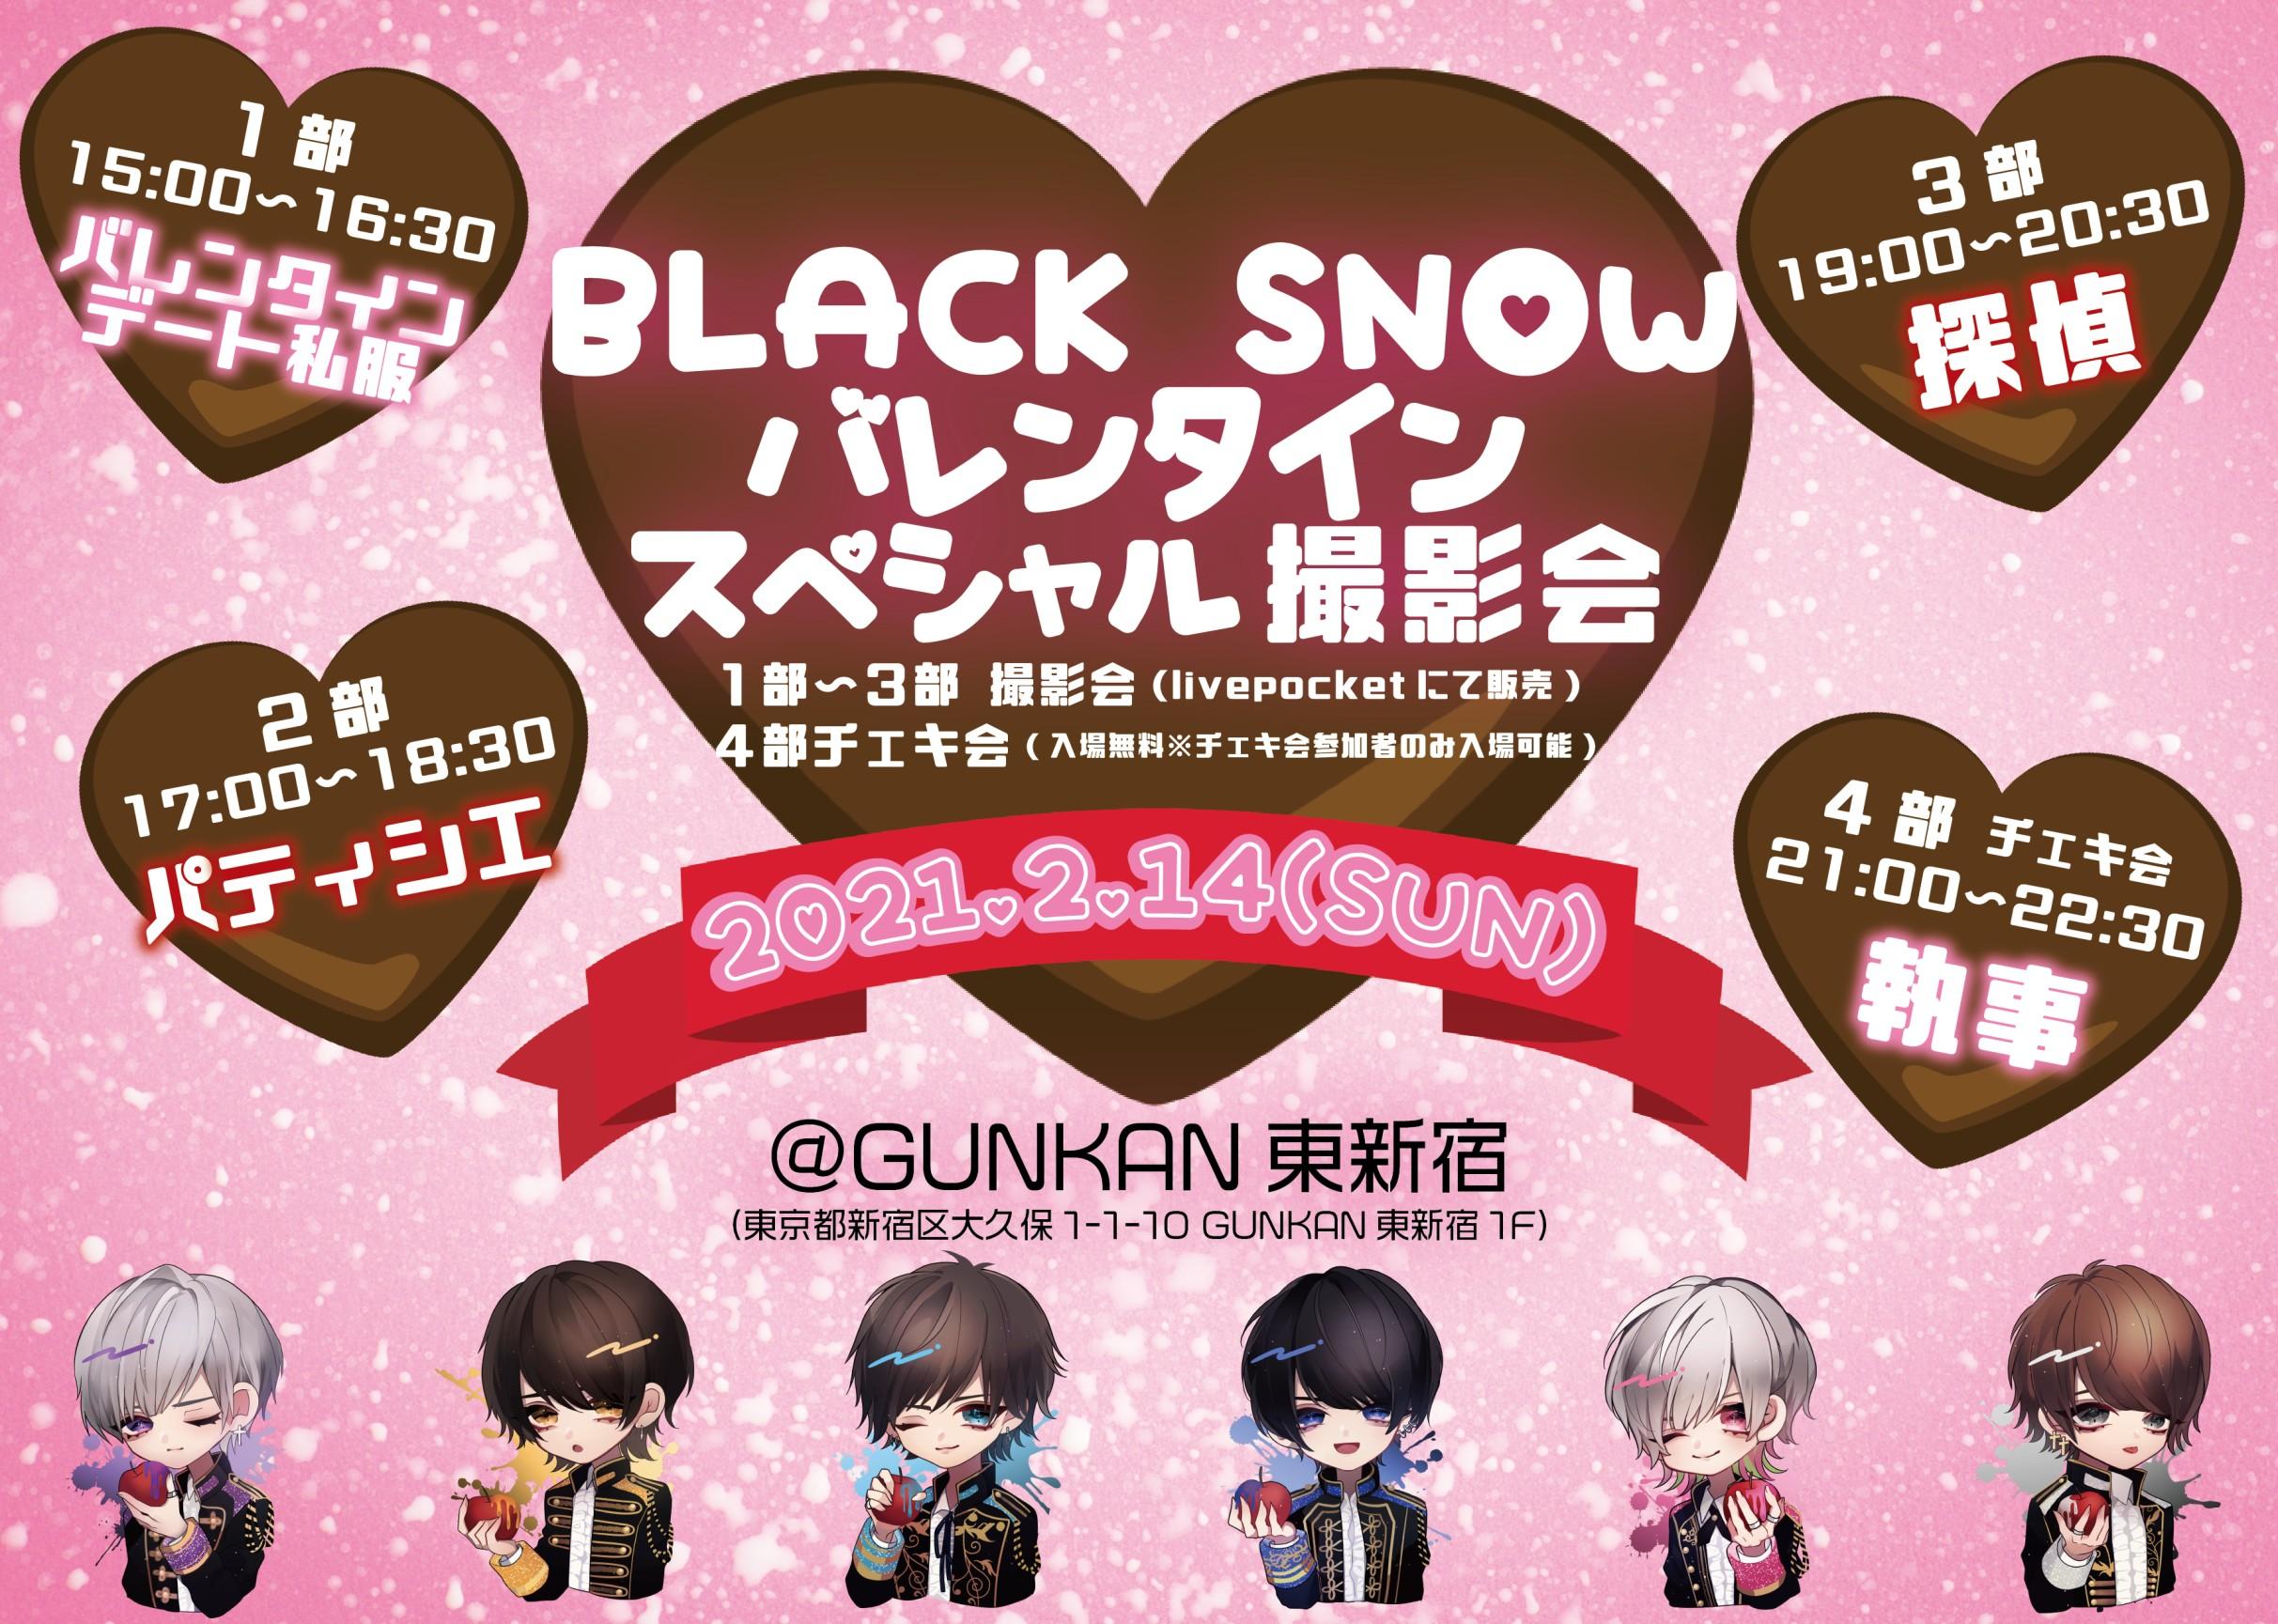 BLACK SNOWバレンタインスペシャル撮影会【3部】